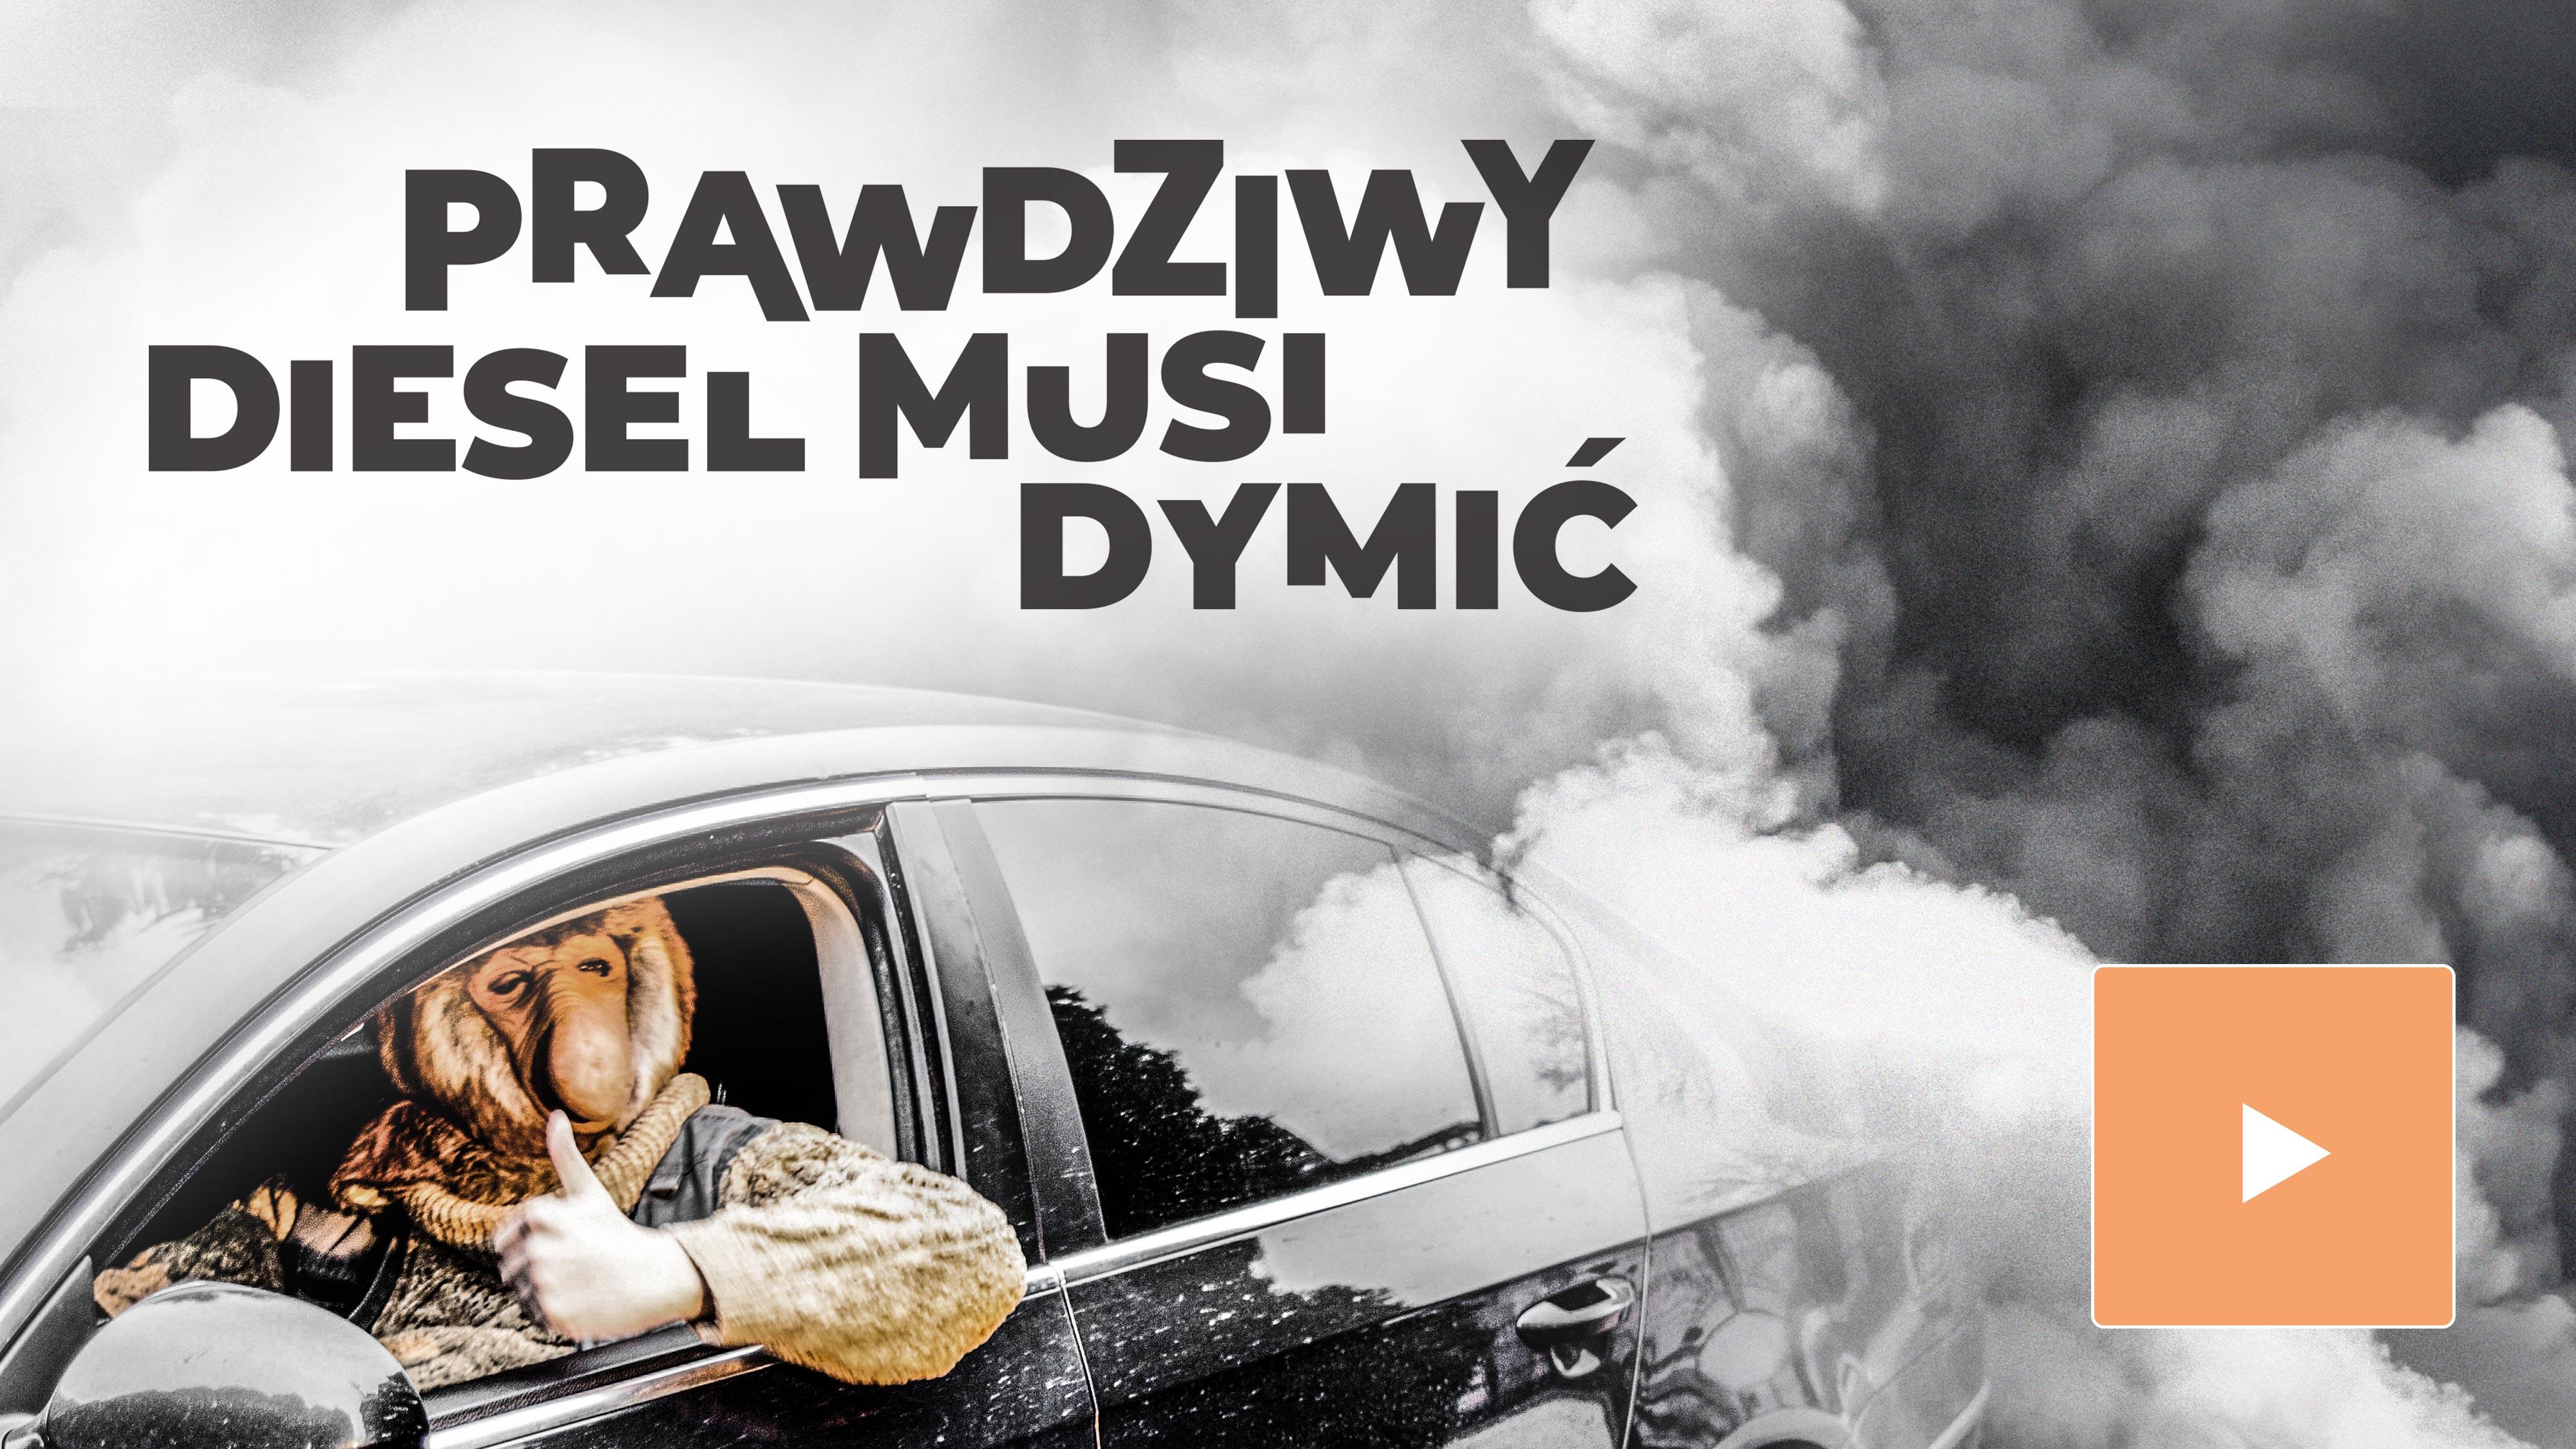 https://krajowytransport.pl/images/zdjd/dieselsmog.jpg